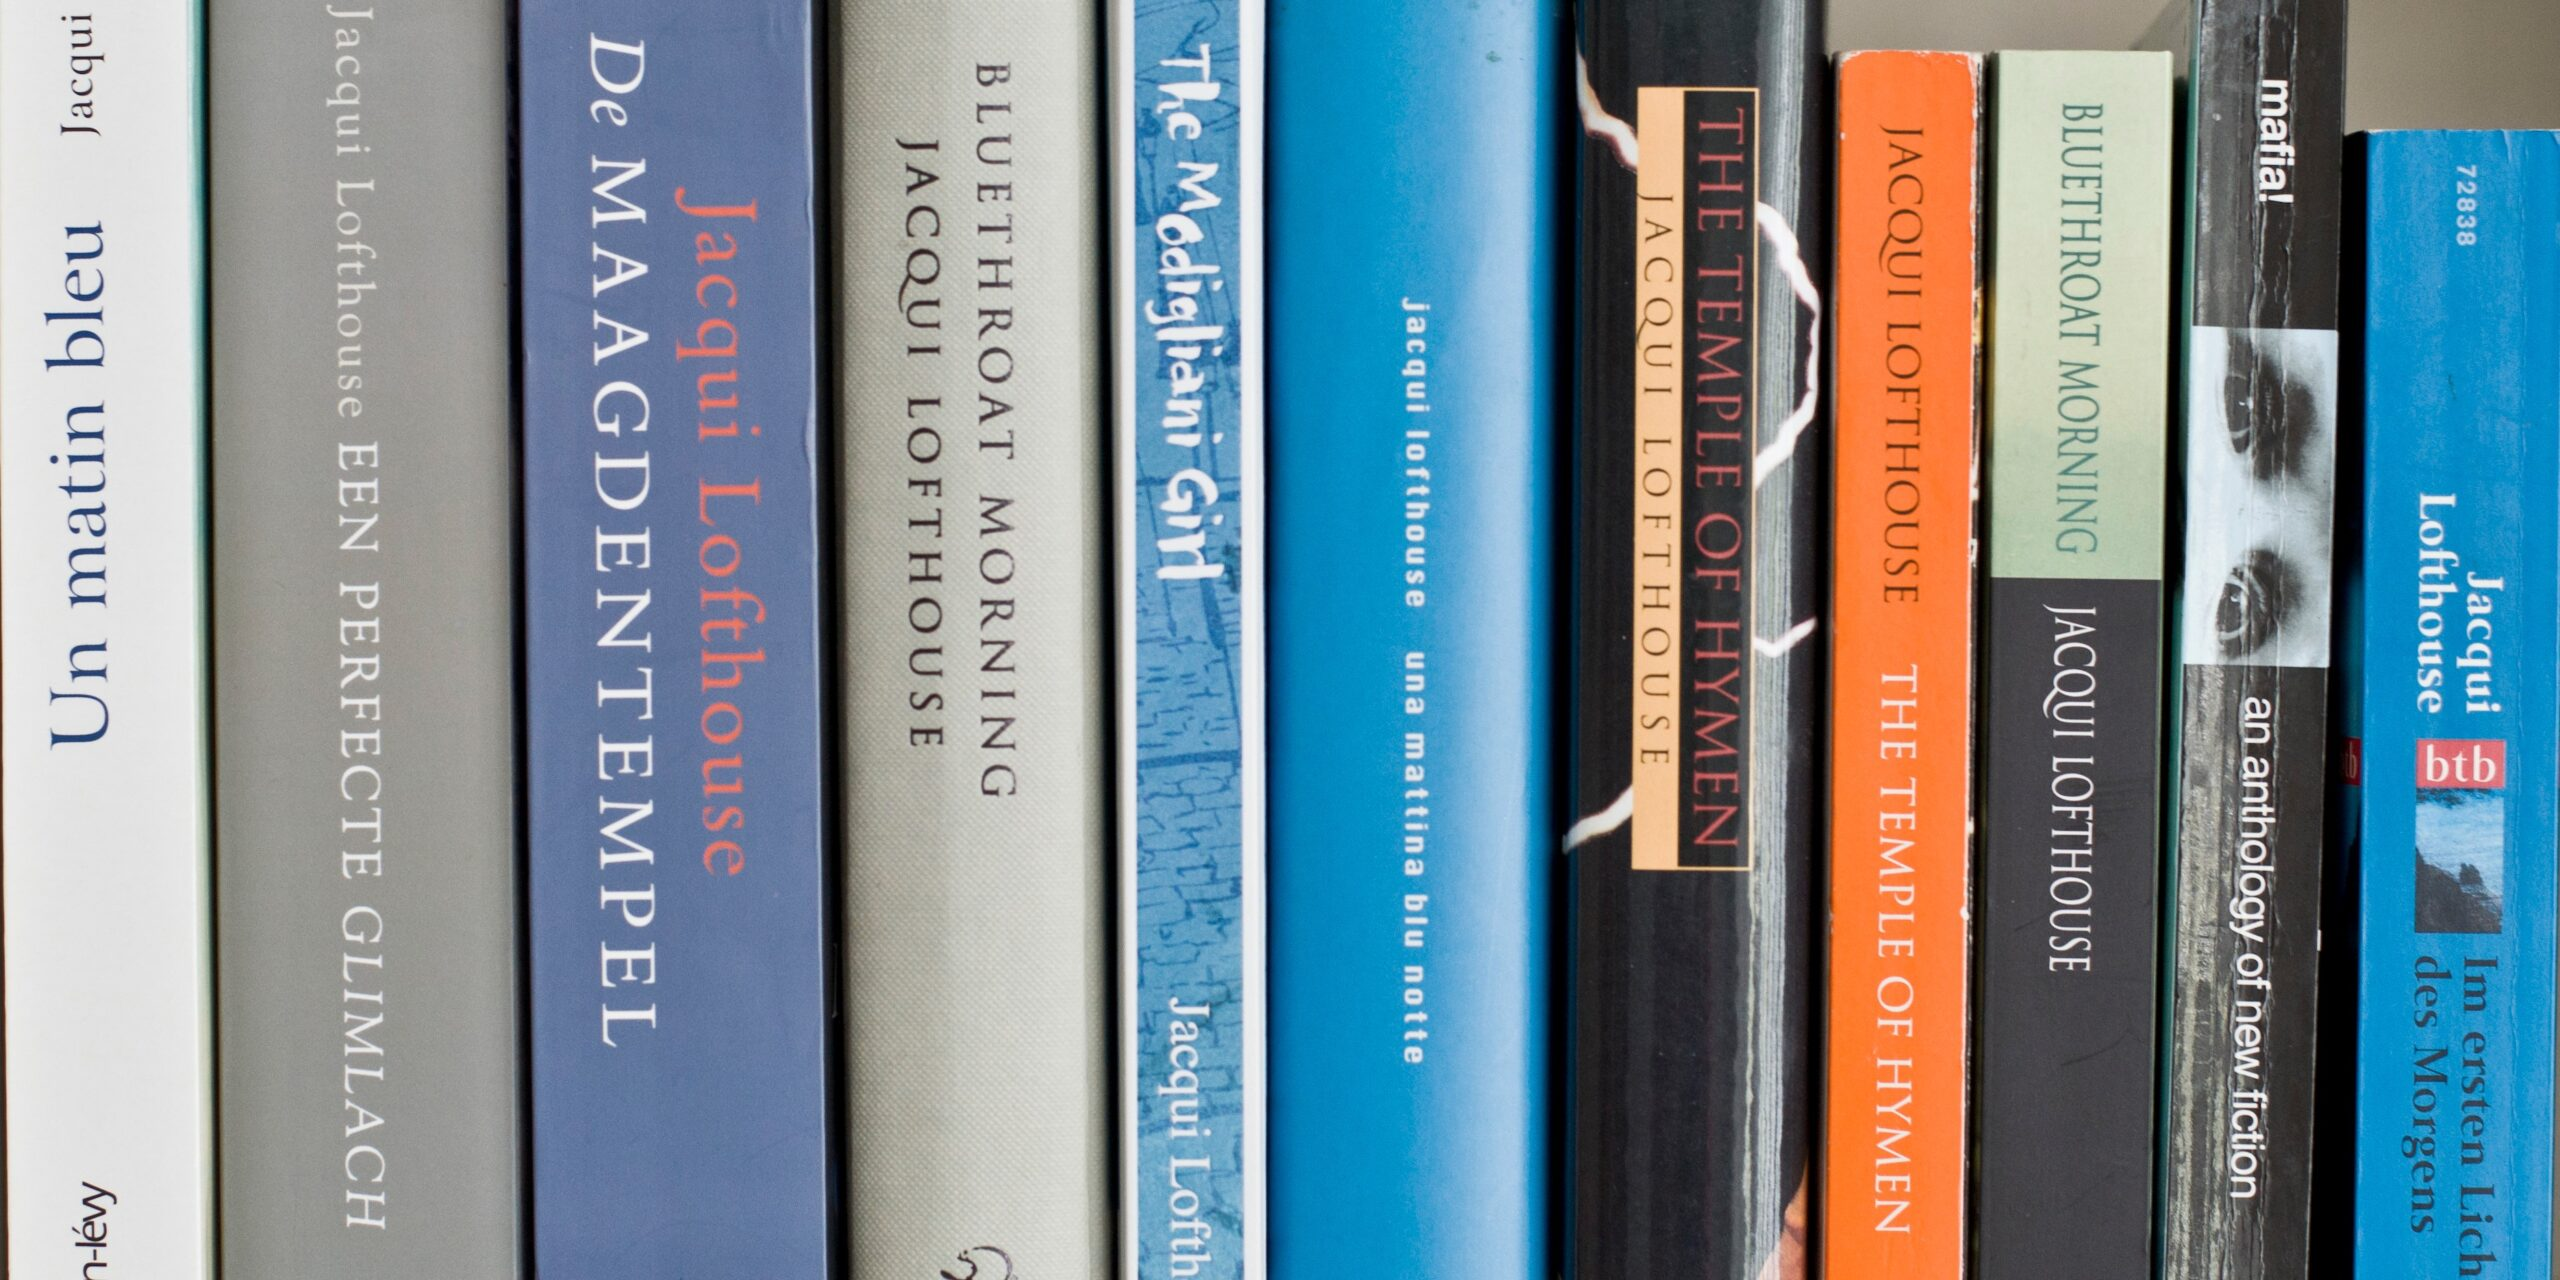 Novels by Jacqui Lofthouse